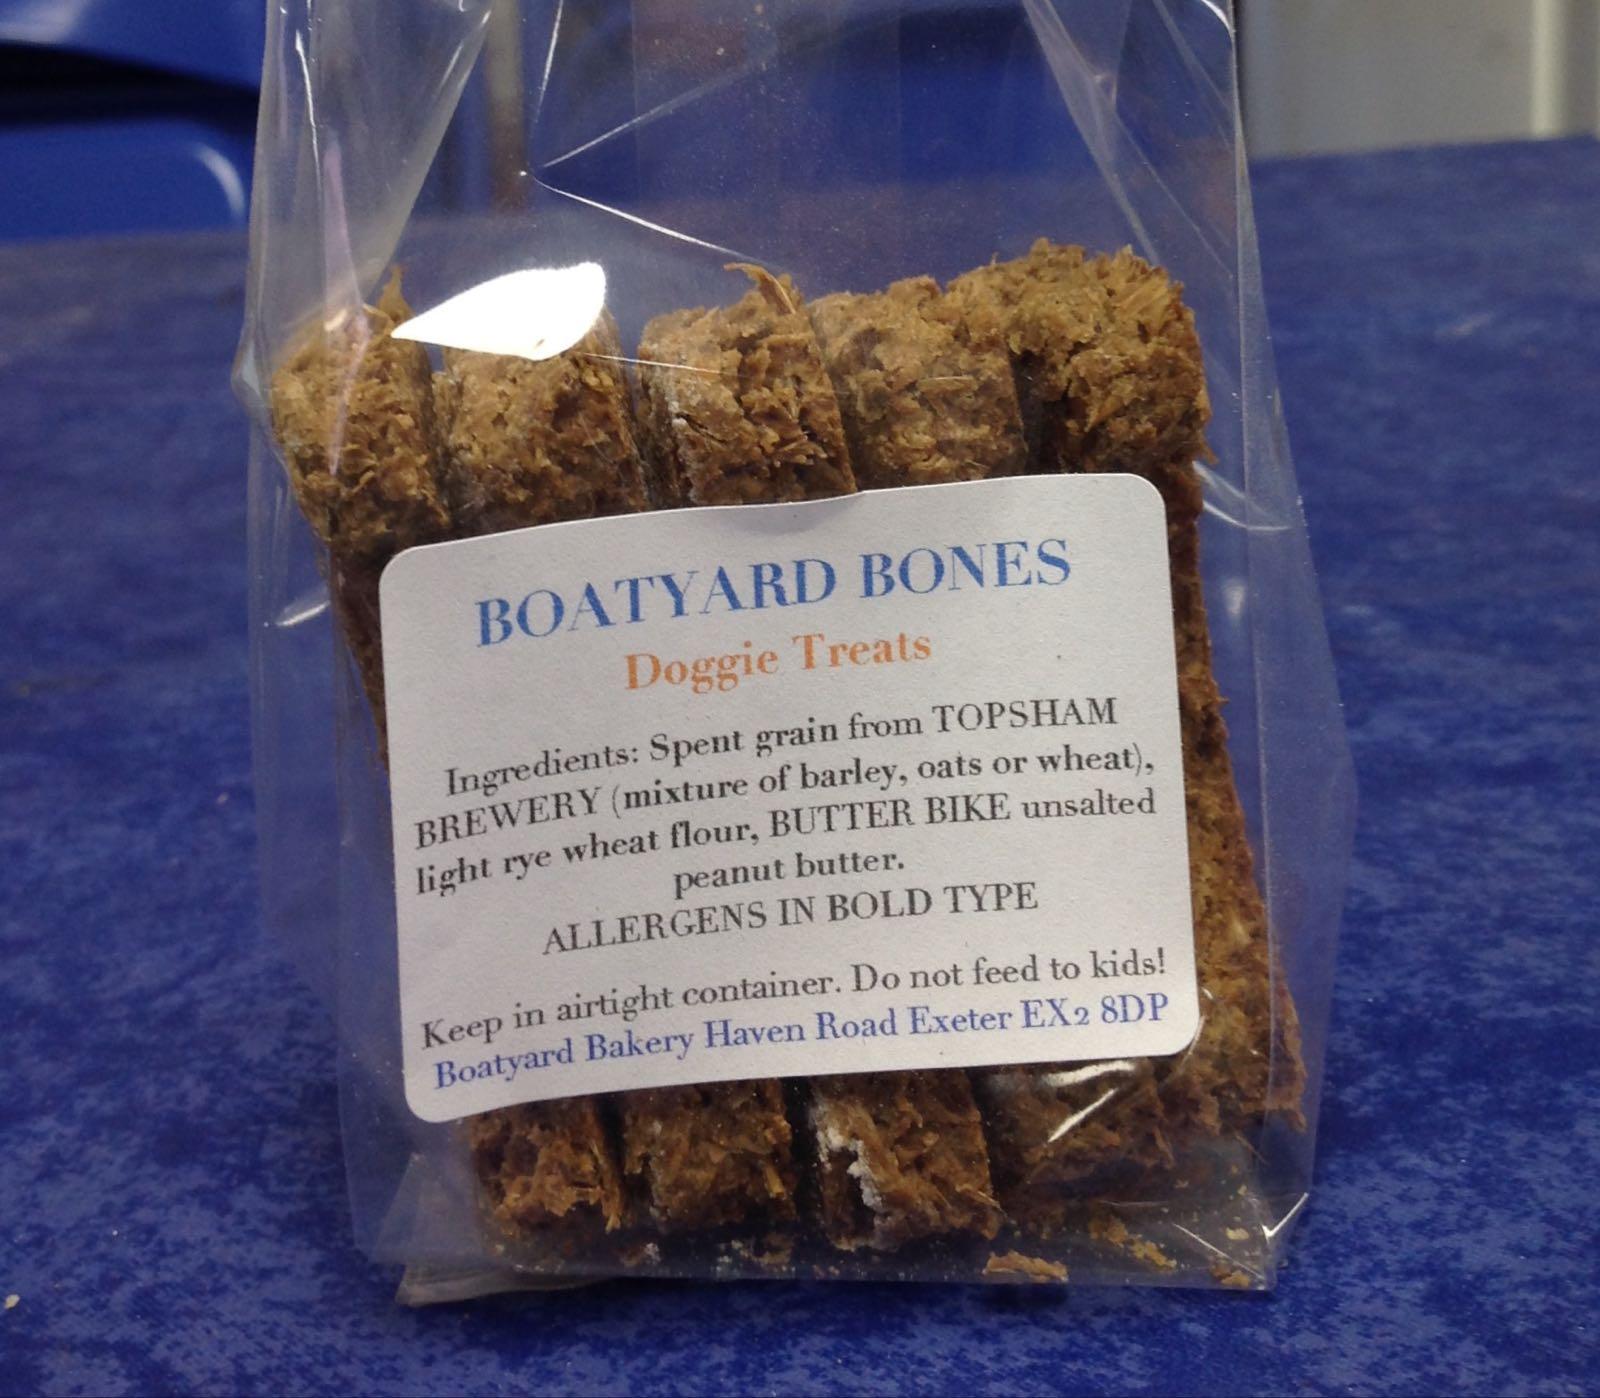 Boatyard bones- Doggie treats